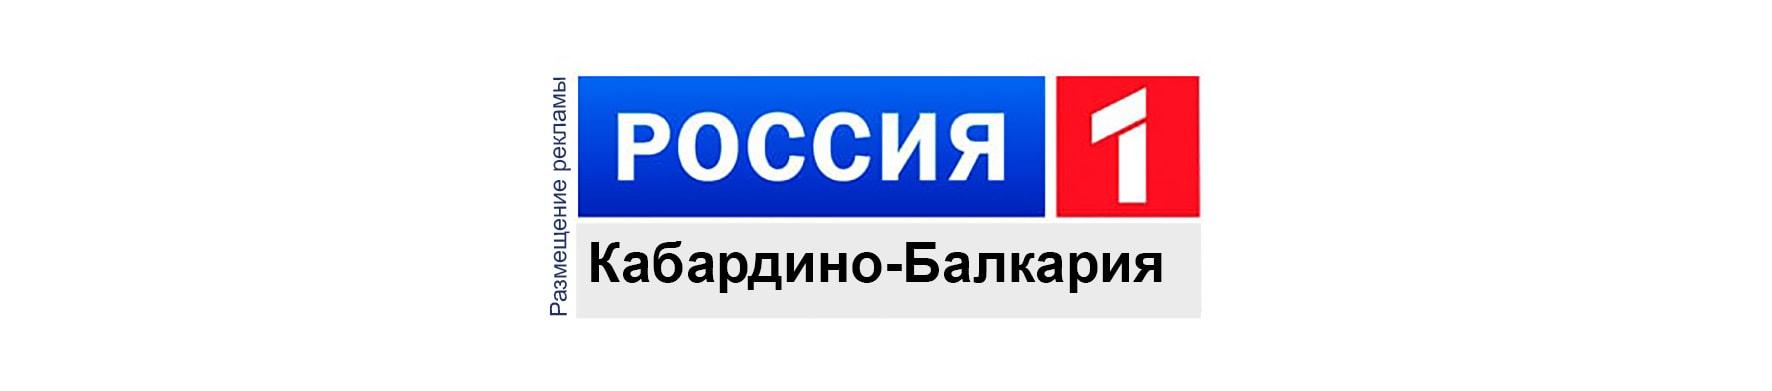 Реклама на телевидении в Кабардино-Балкарии Россия1